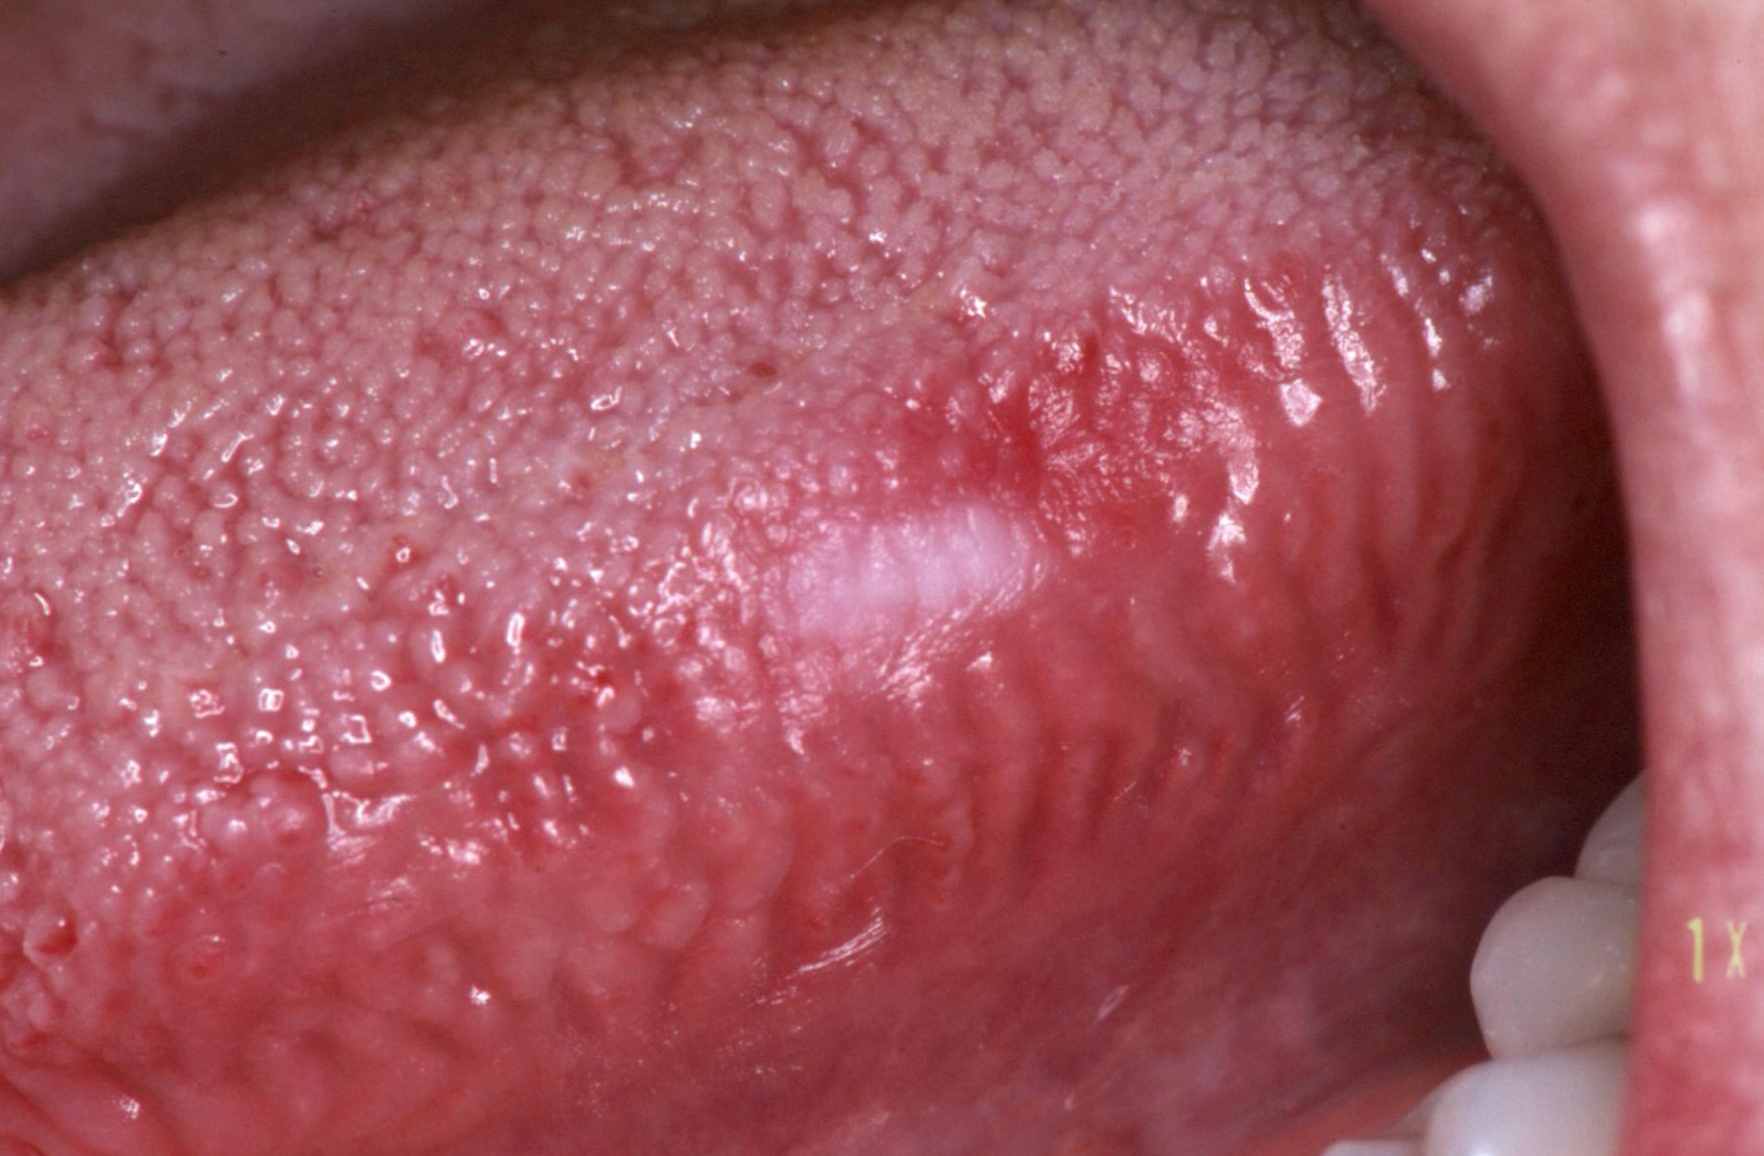 papillomavírus nyelvtünete